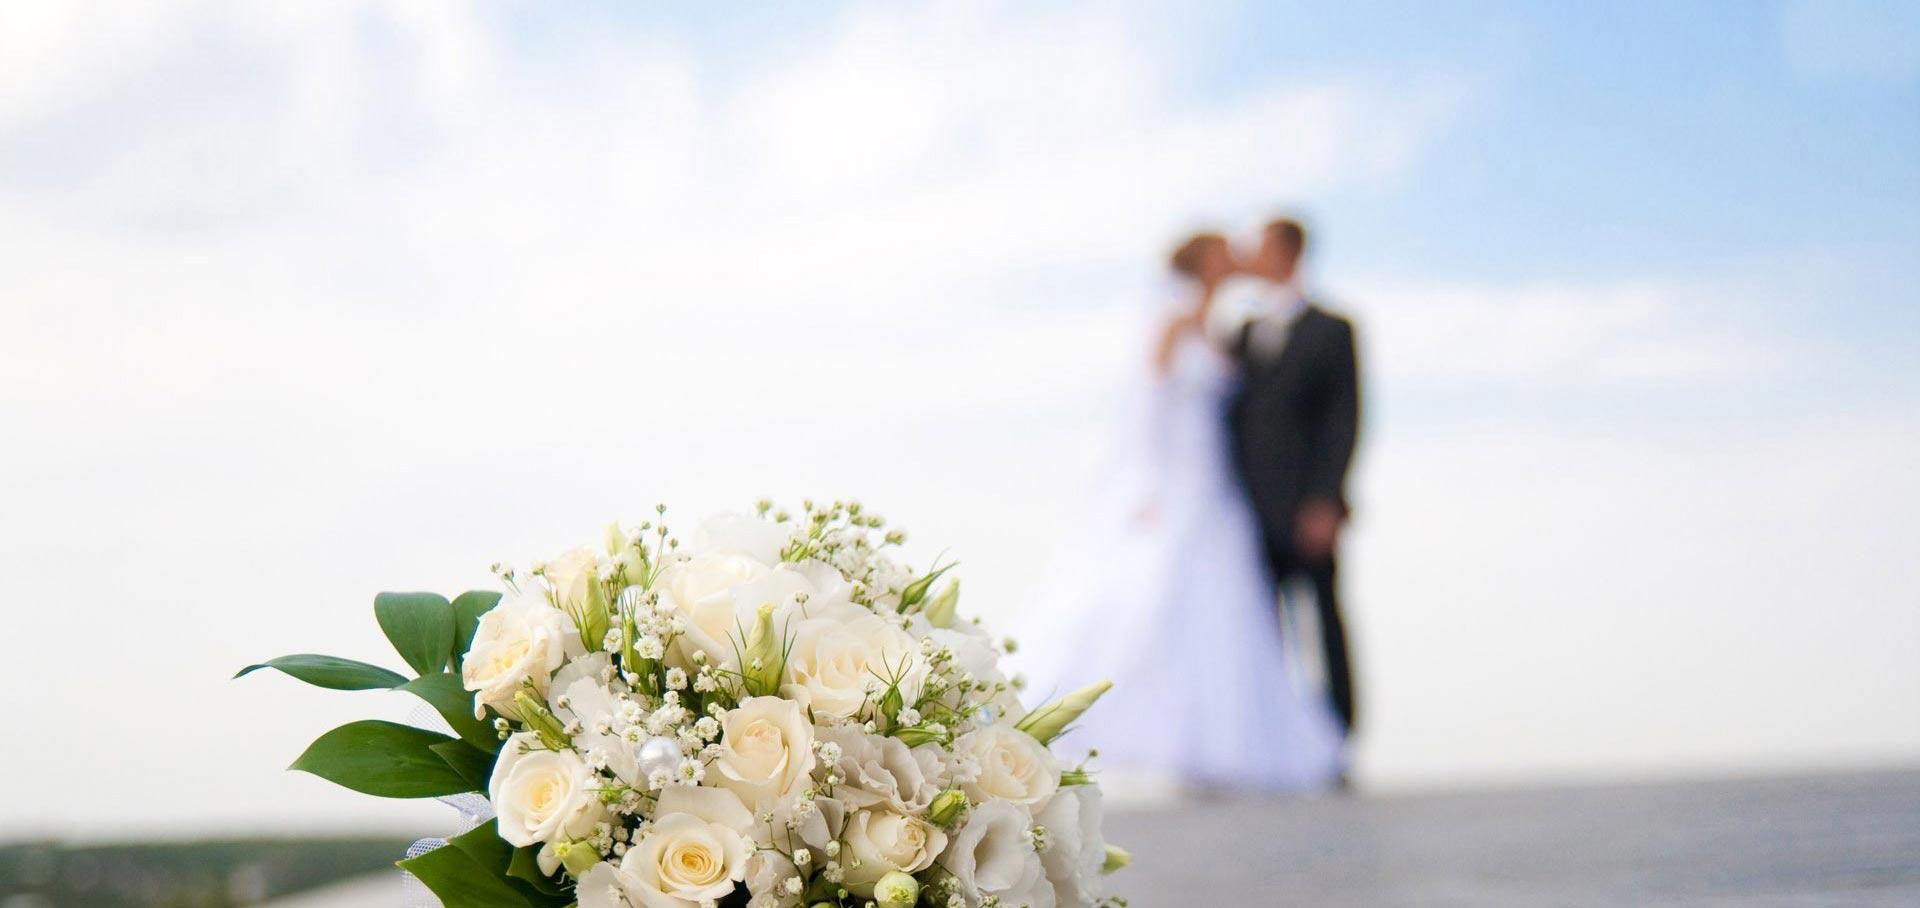 especial-bodas